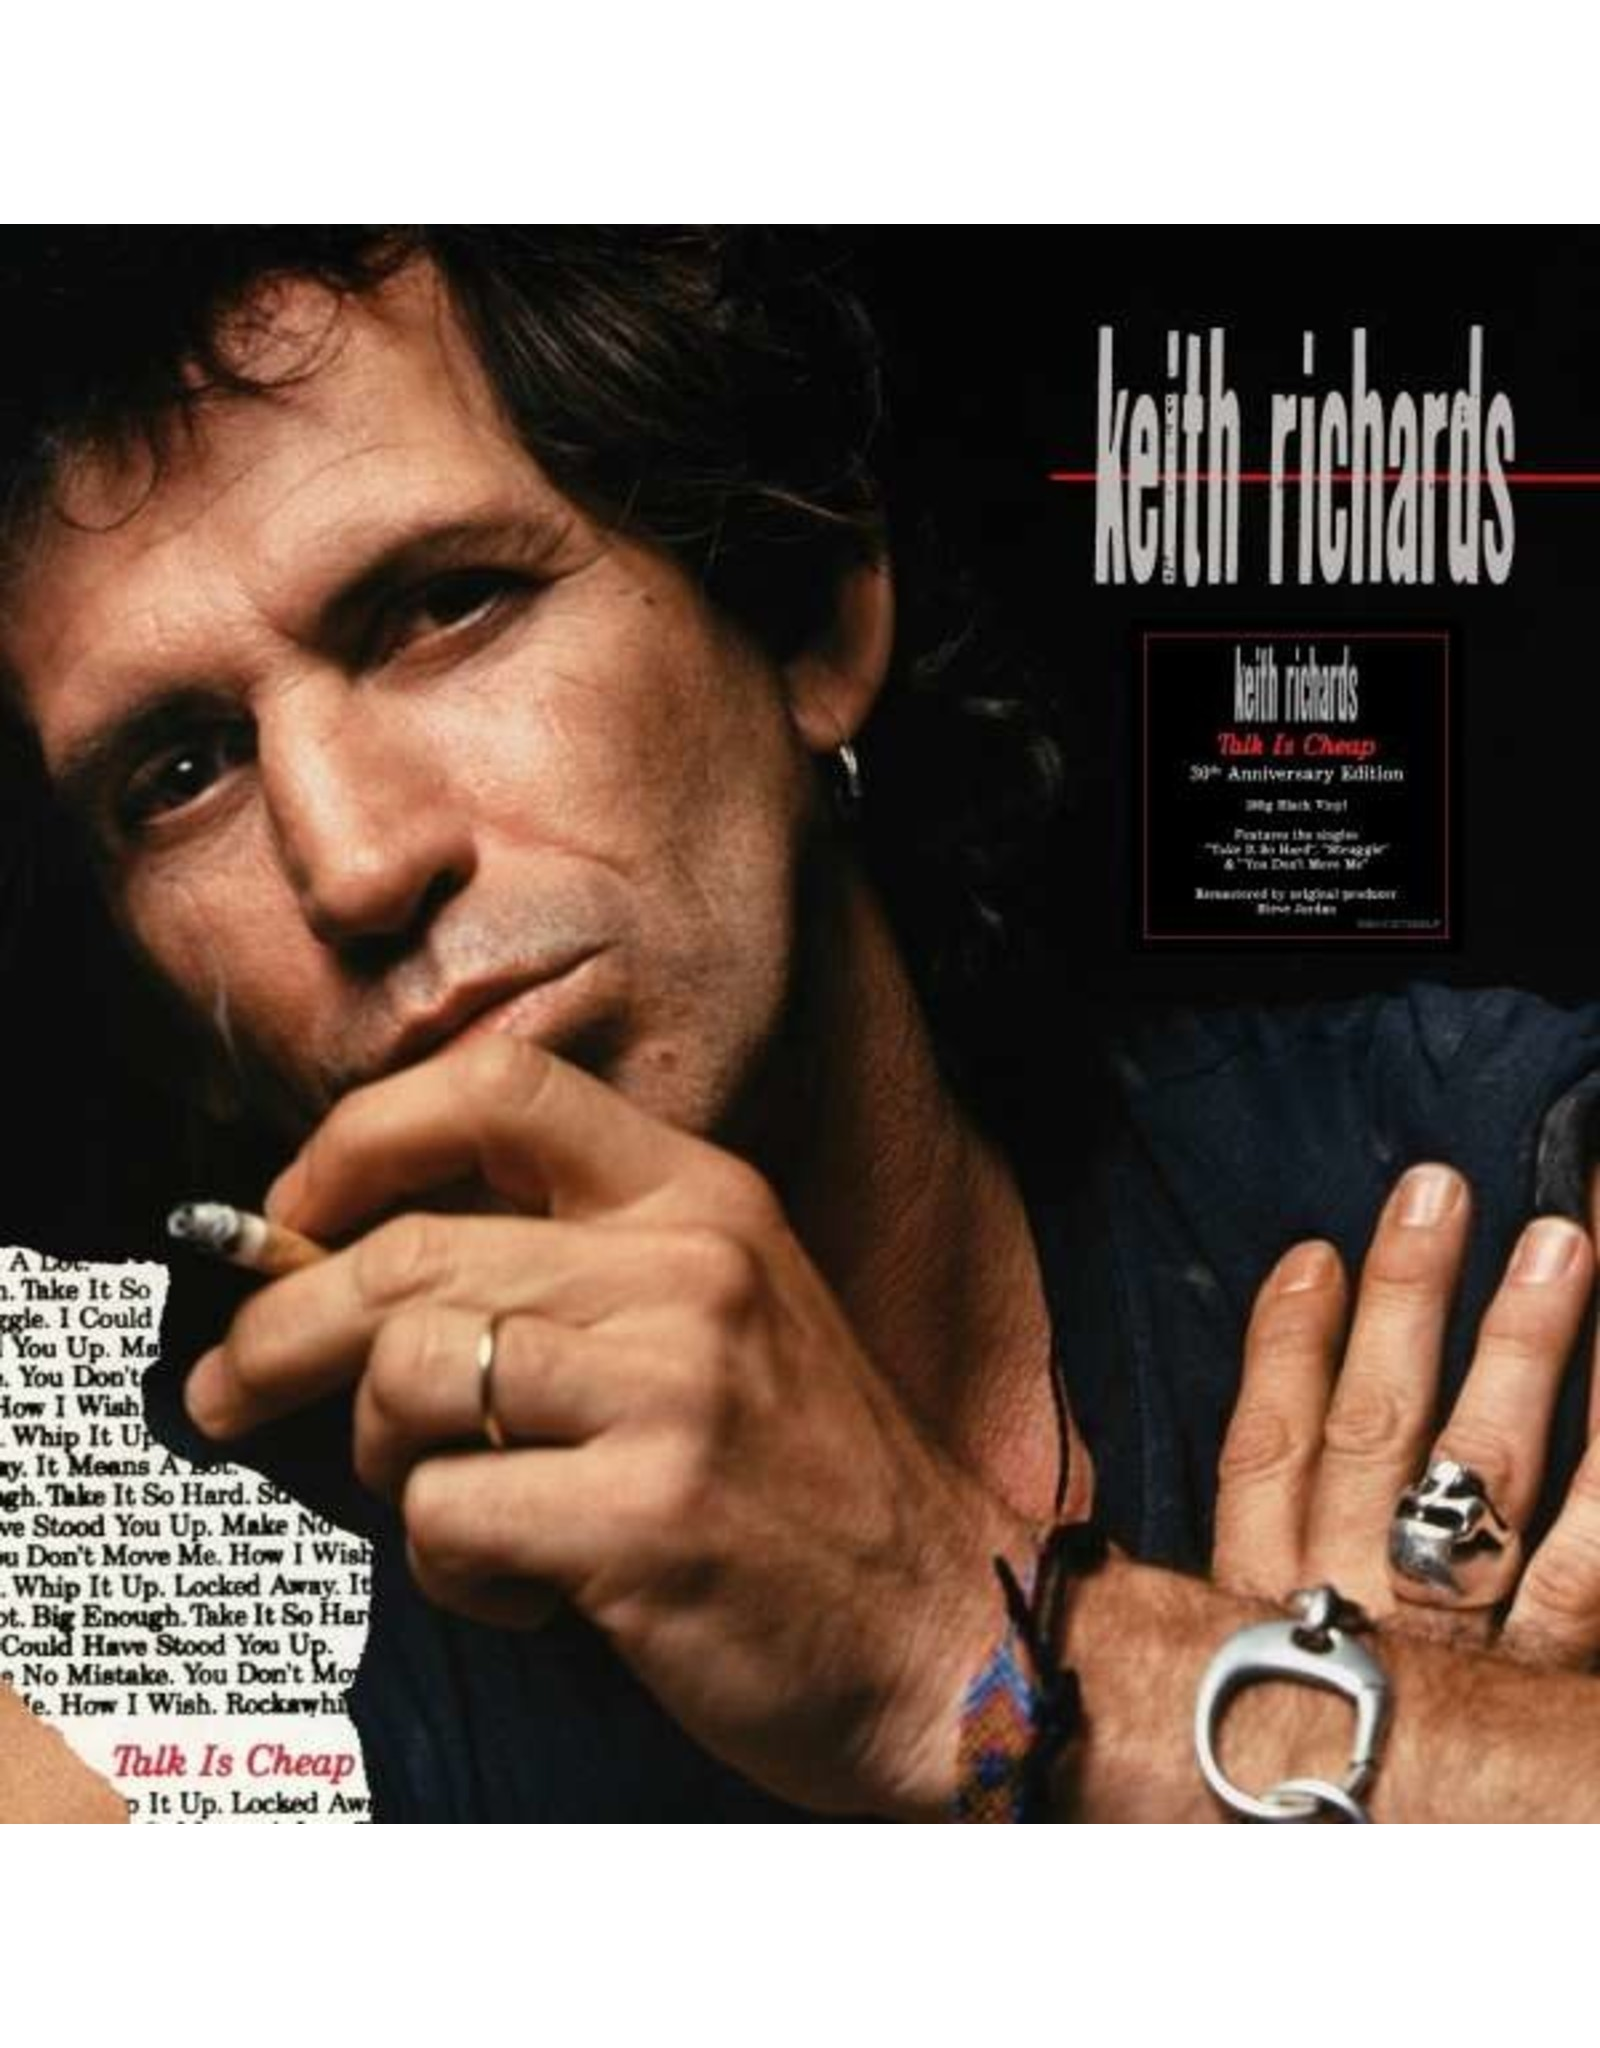 Richards, Keith - Talk Is Cheap (30th Anniversary) LP